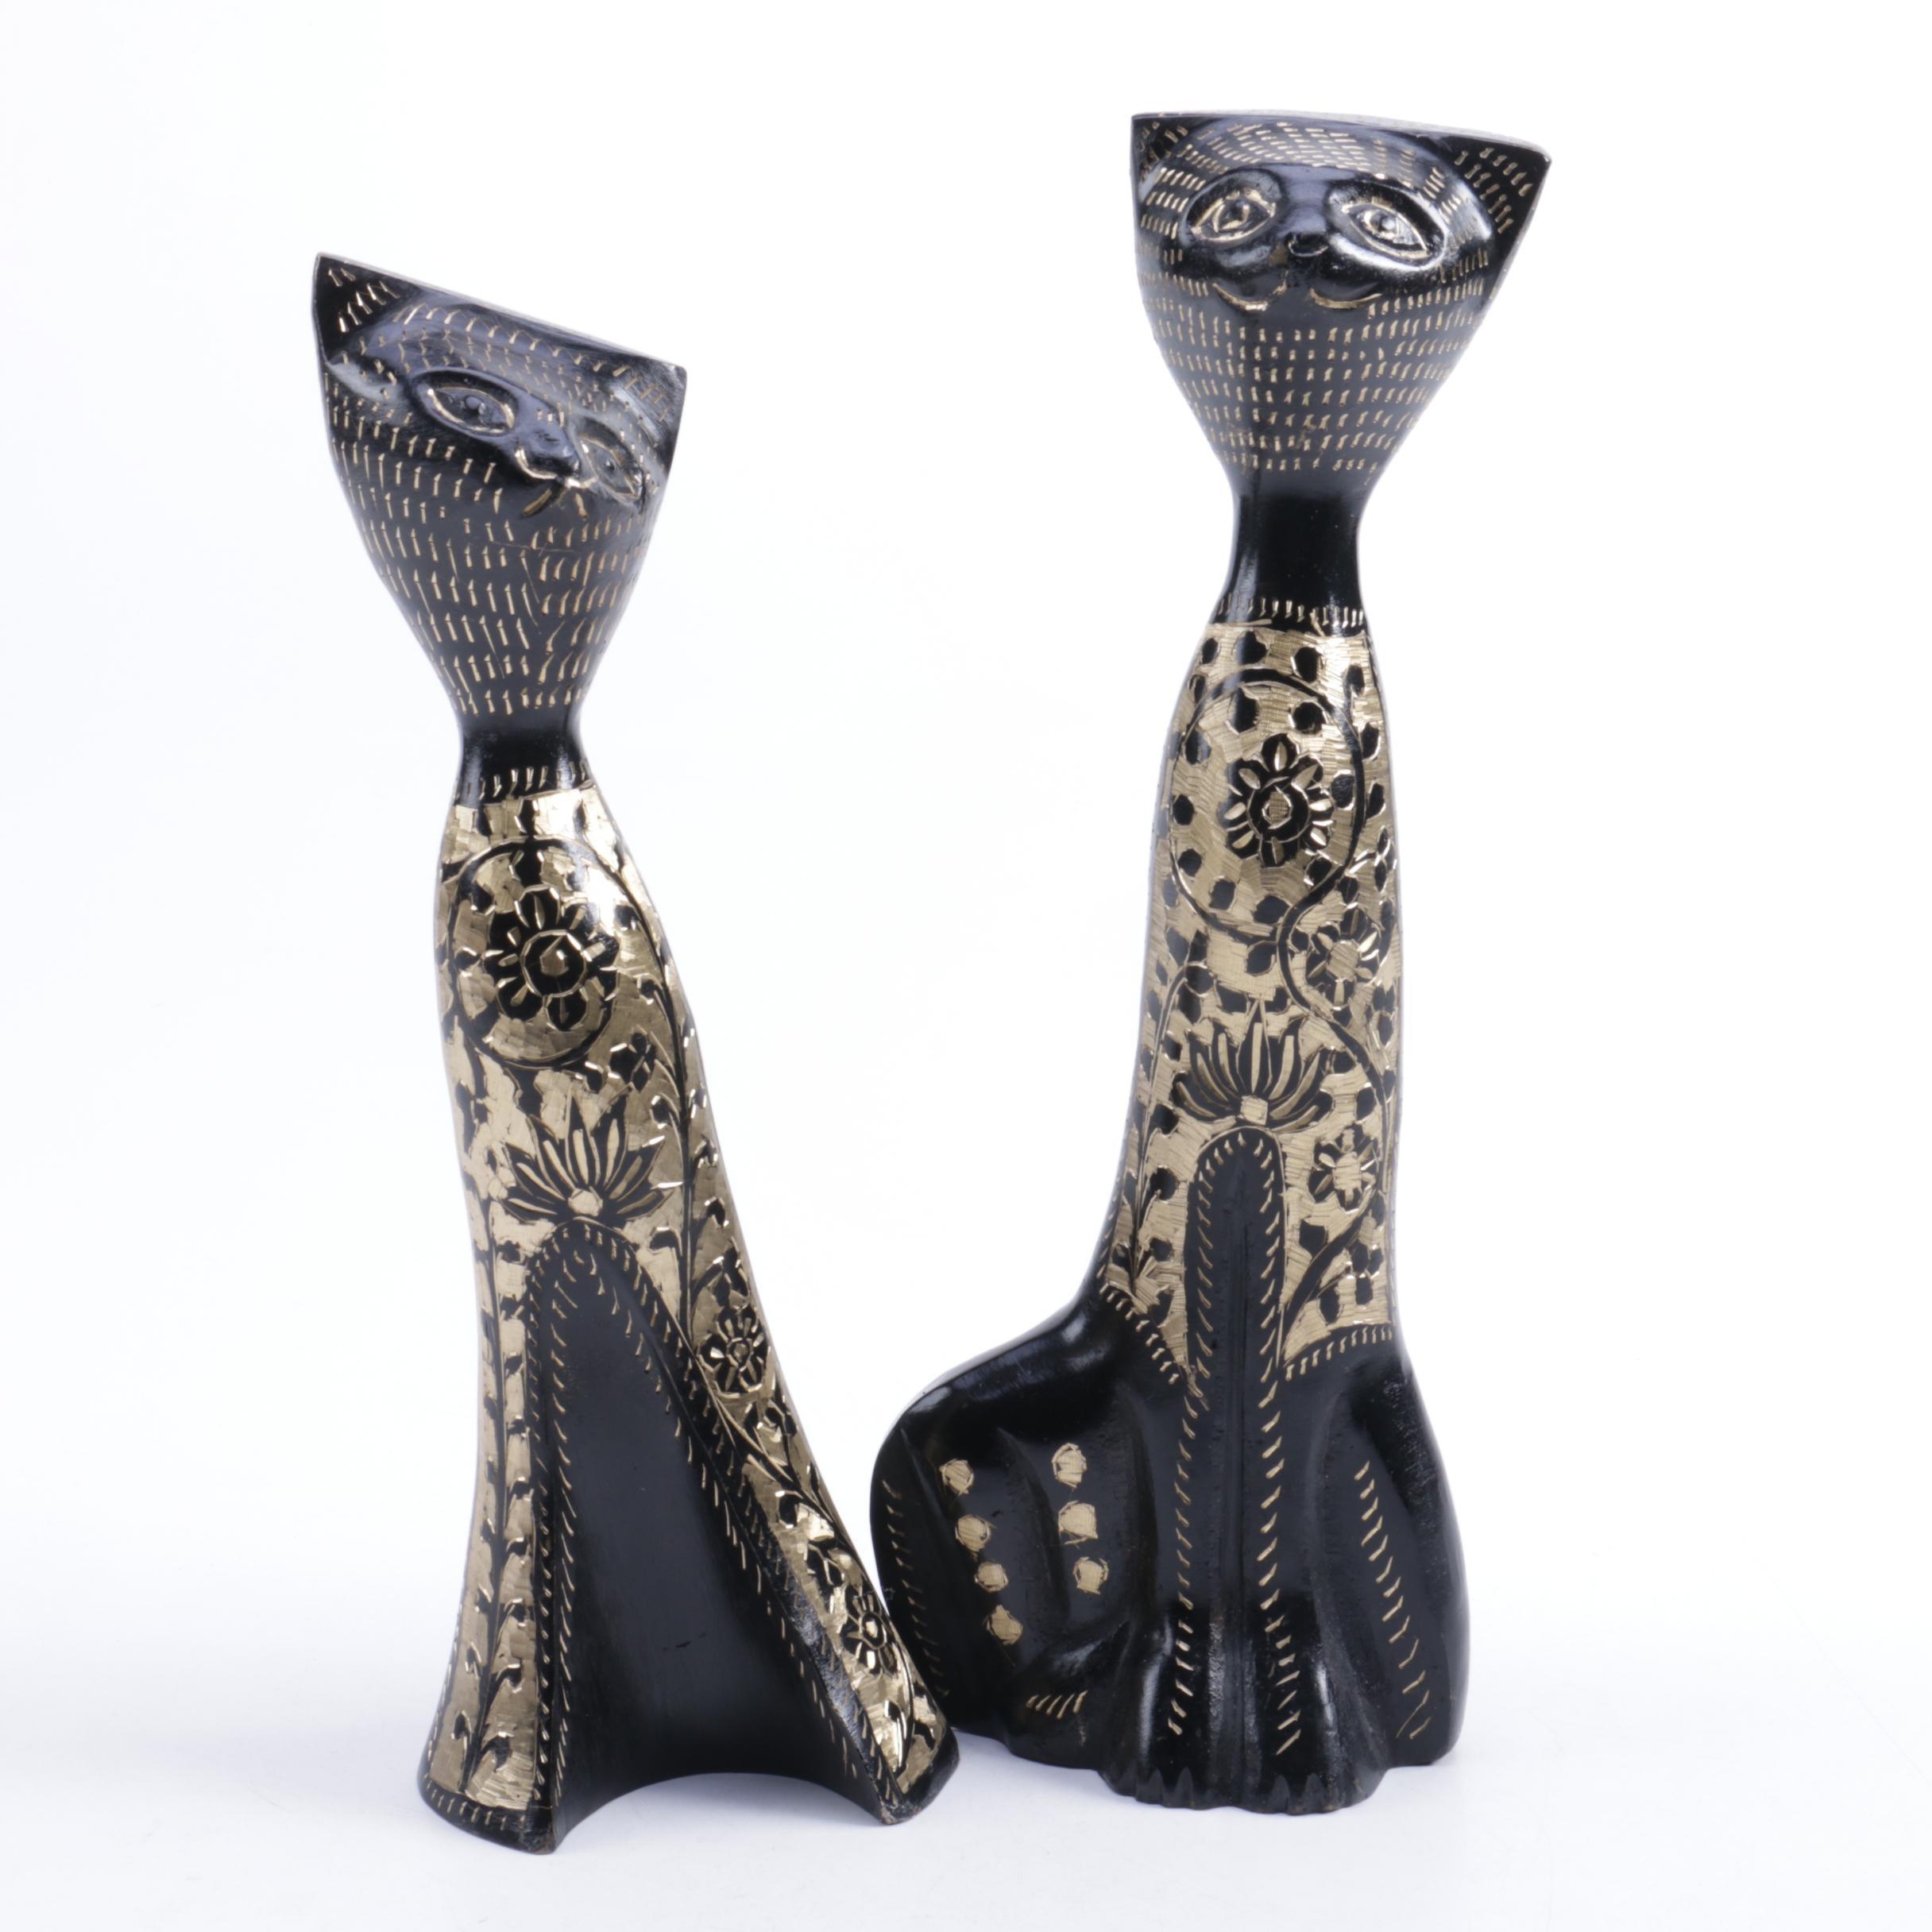 Whimsical Black Cat Figurines